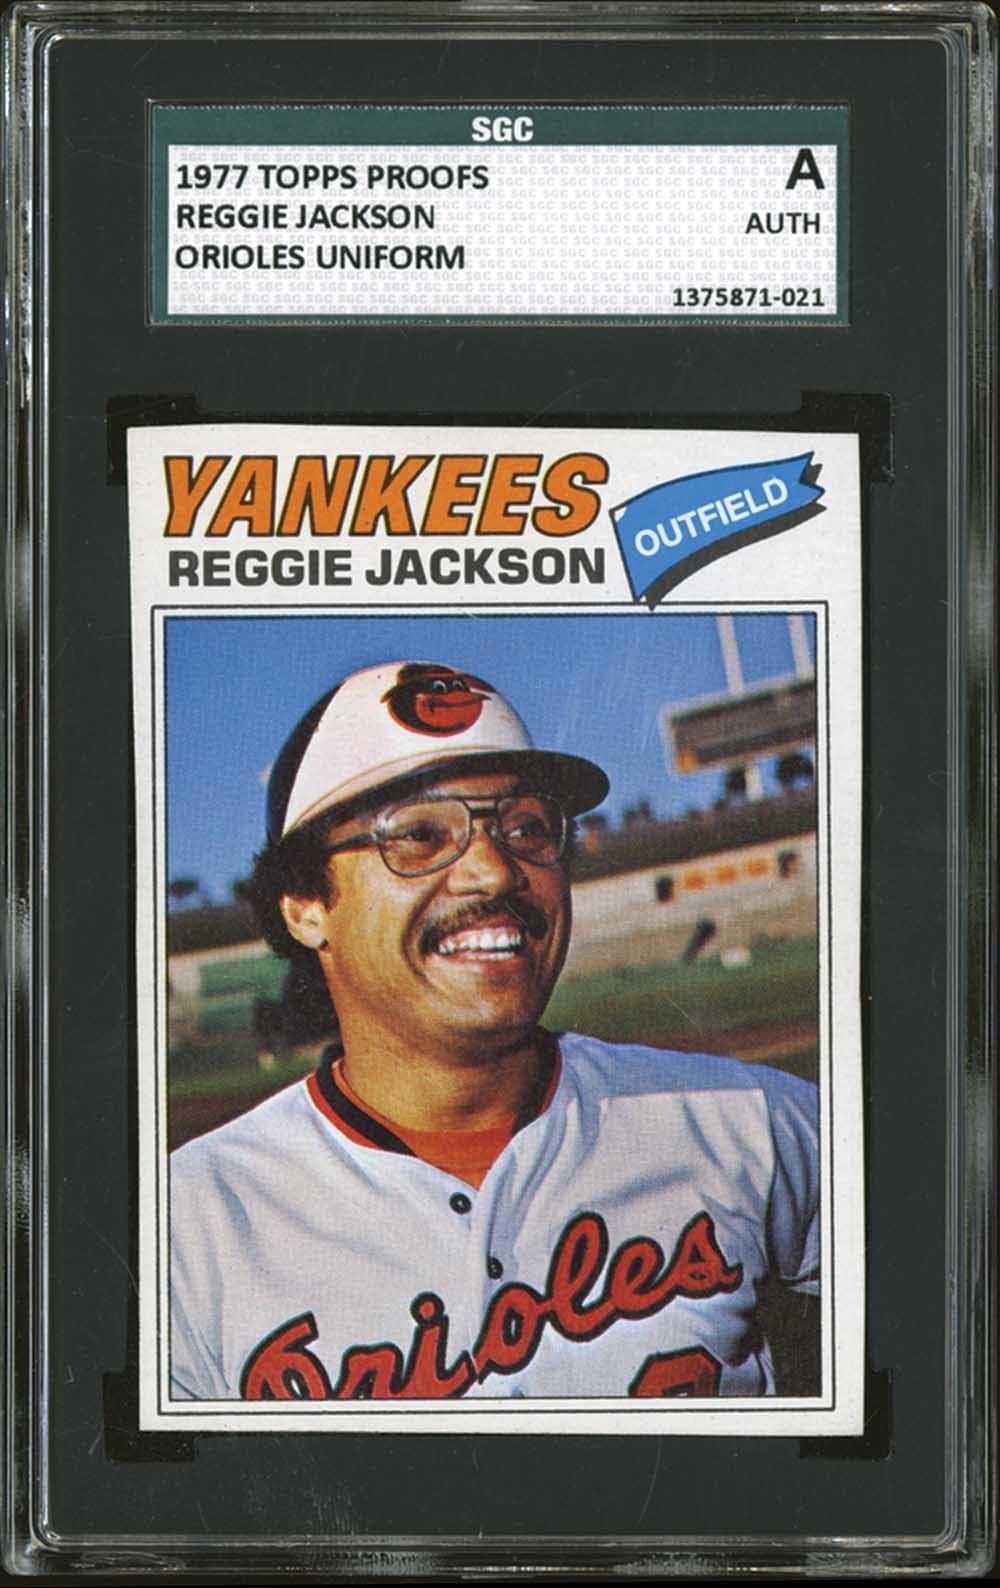 Lot 1197 1977 Topps Reggie Jackson Baltimore Orioles